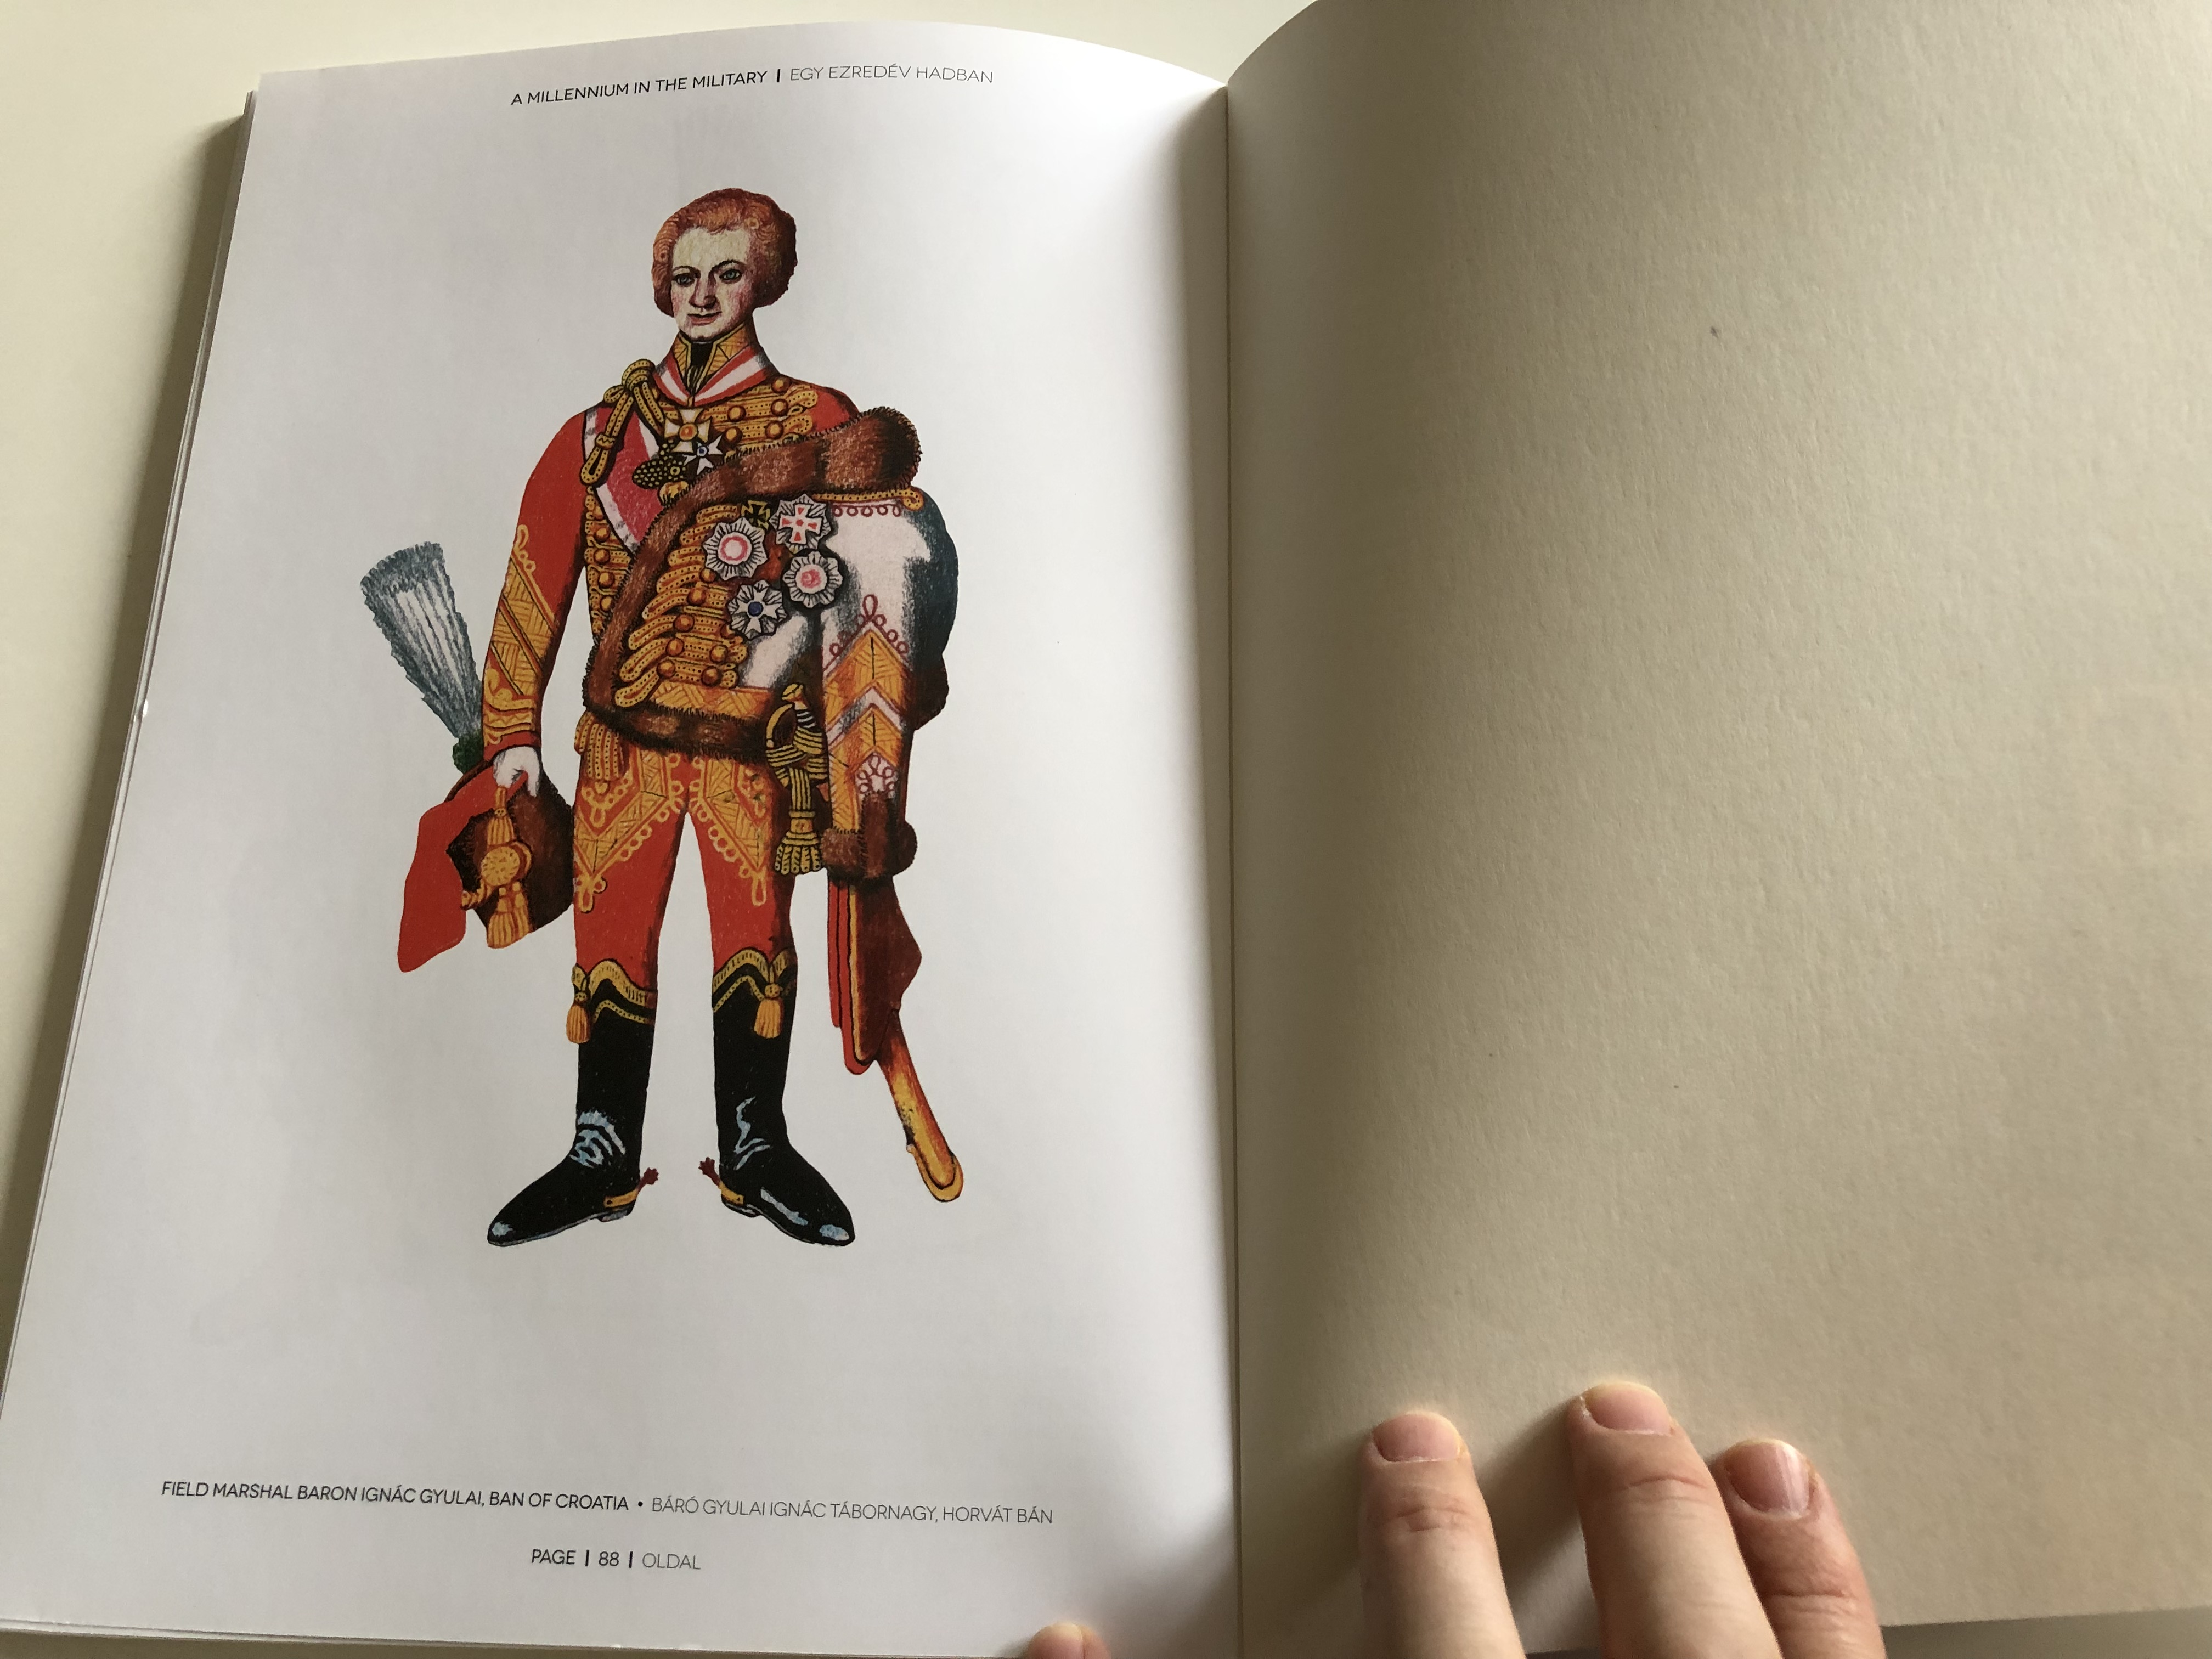 hungarian-military-1768-1848-by-gy-z-somogyi-magyar-katonas-g-1768-1848-a-millennium-in-the-military-egy-ezred-v-hadban-paperback-2013-hm-zr-nyi-14-.jpg